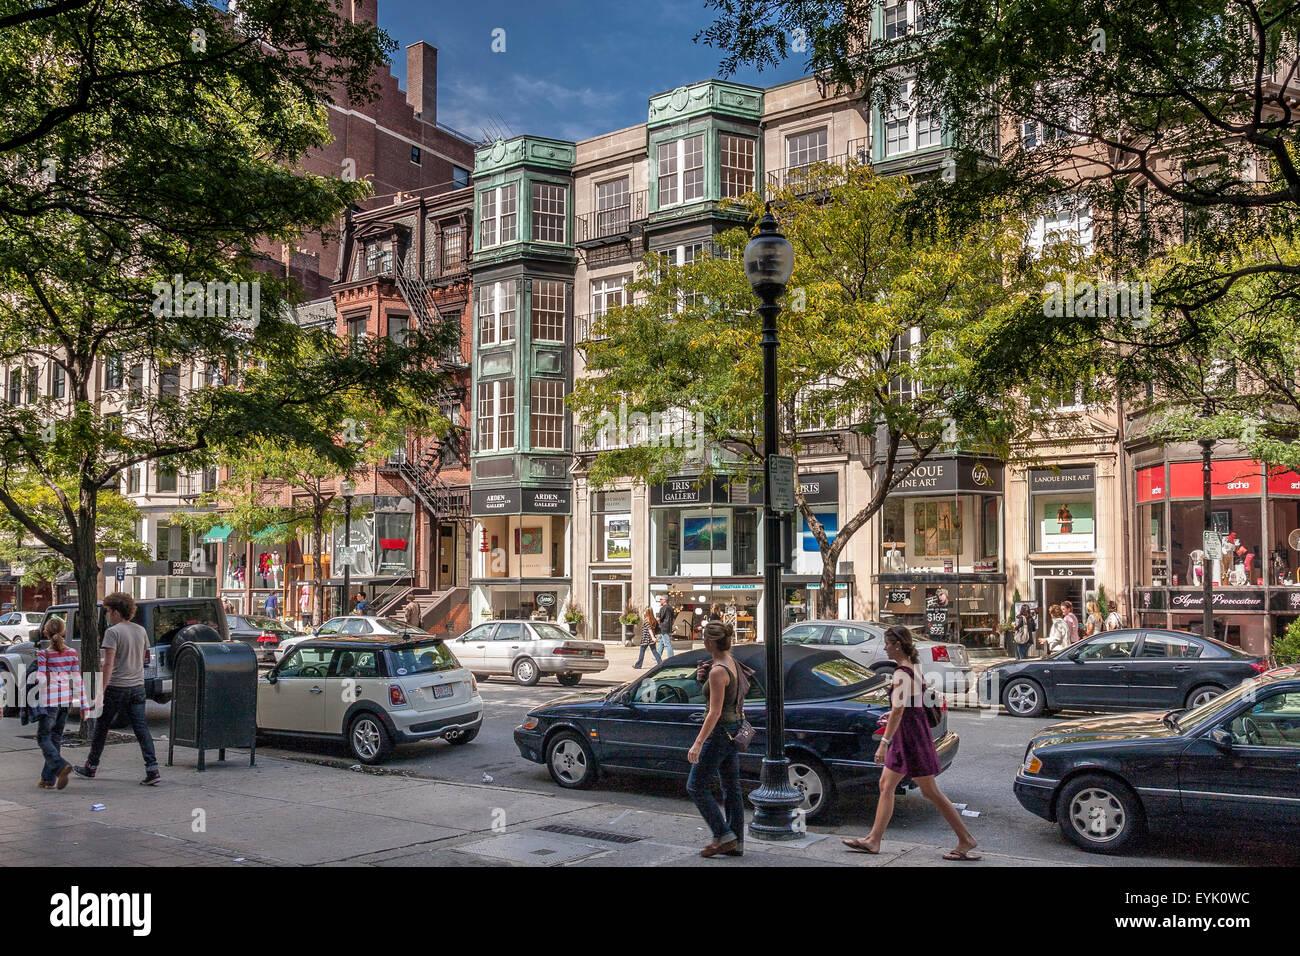 Shoppers and visitors along Newbury Street ,Boston's premier shopping destination, Boston ,Massachusetts Stock Photo